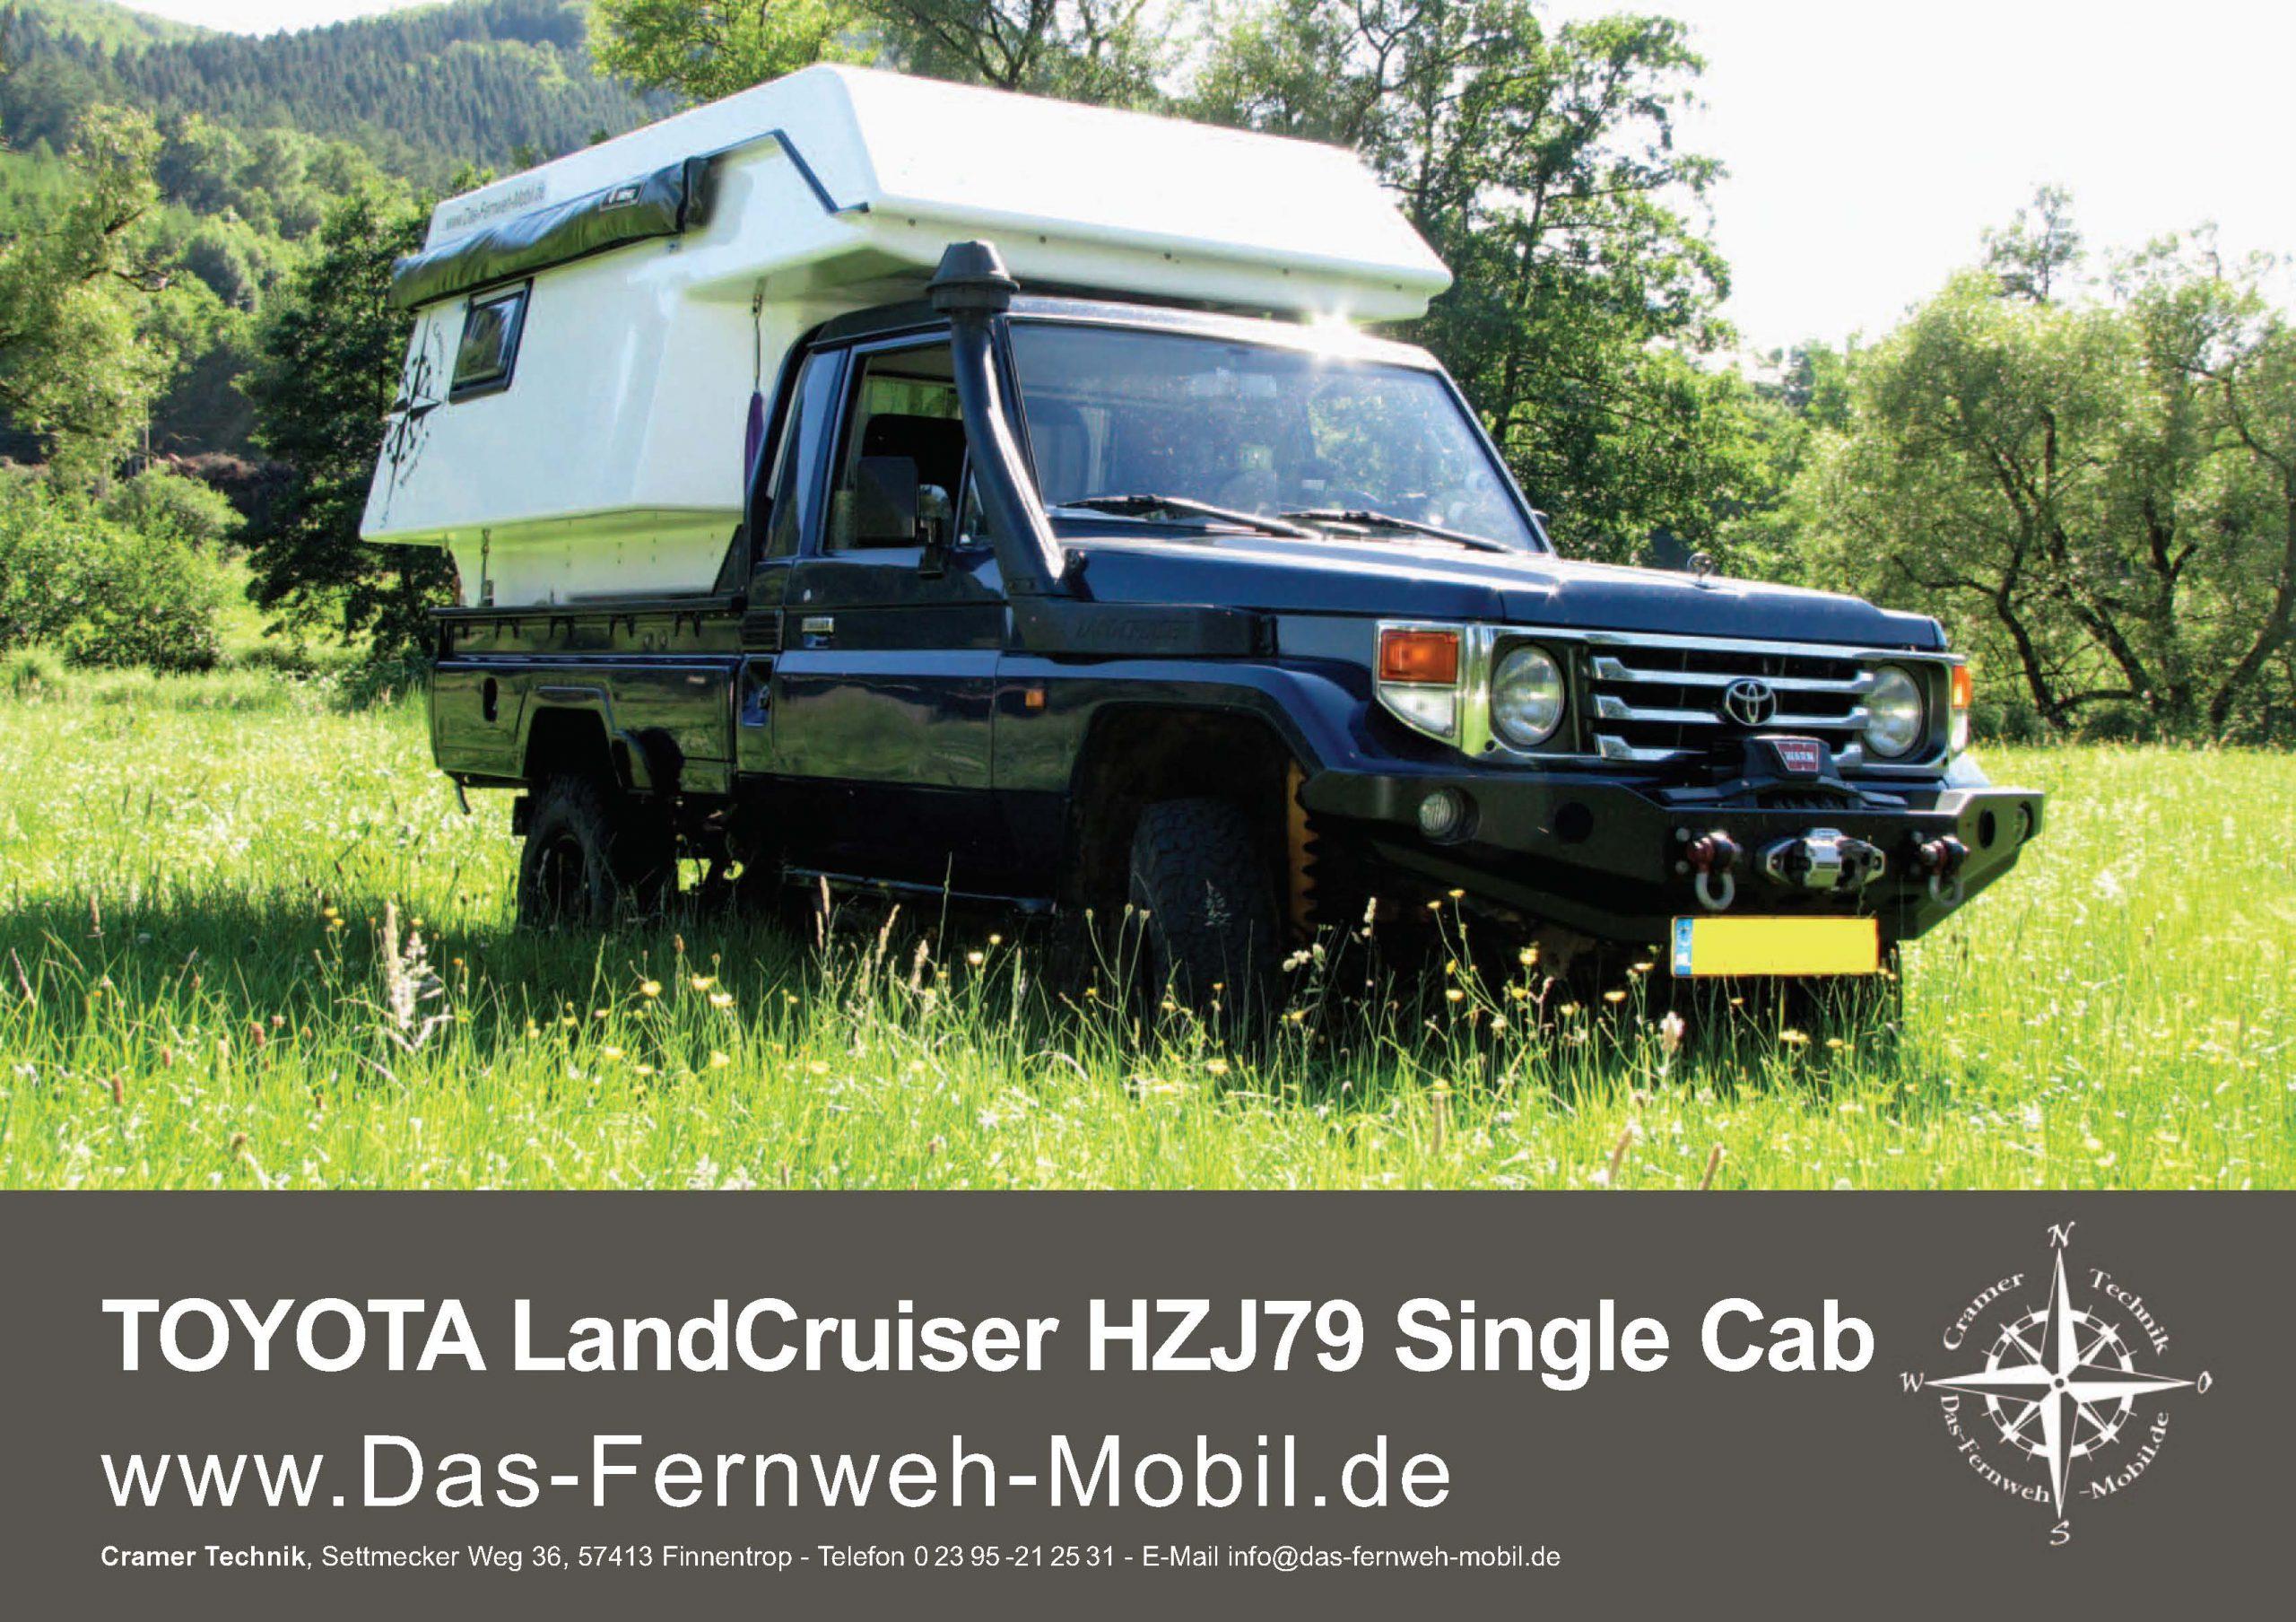 datenblatt-Toyota LandCruiser HZJ79 Single Cab-102019-k_Seite_1